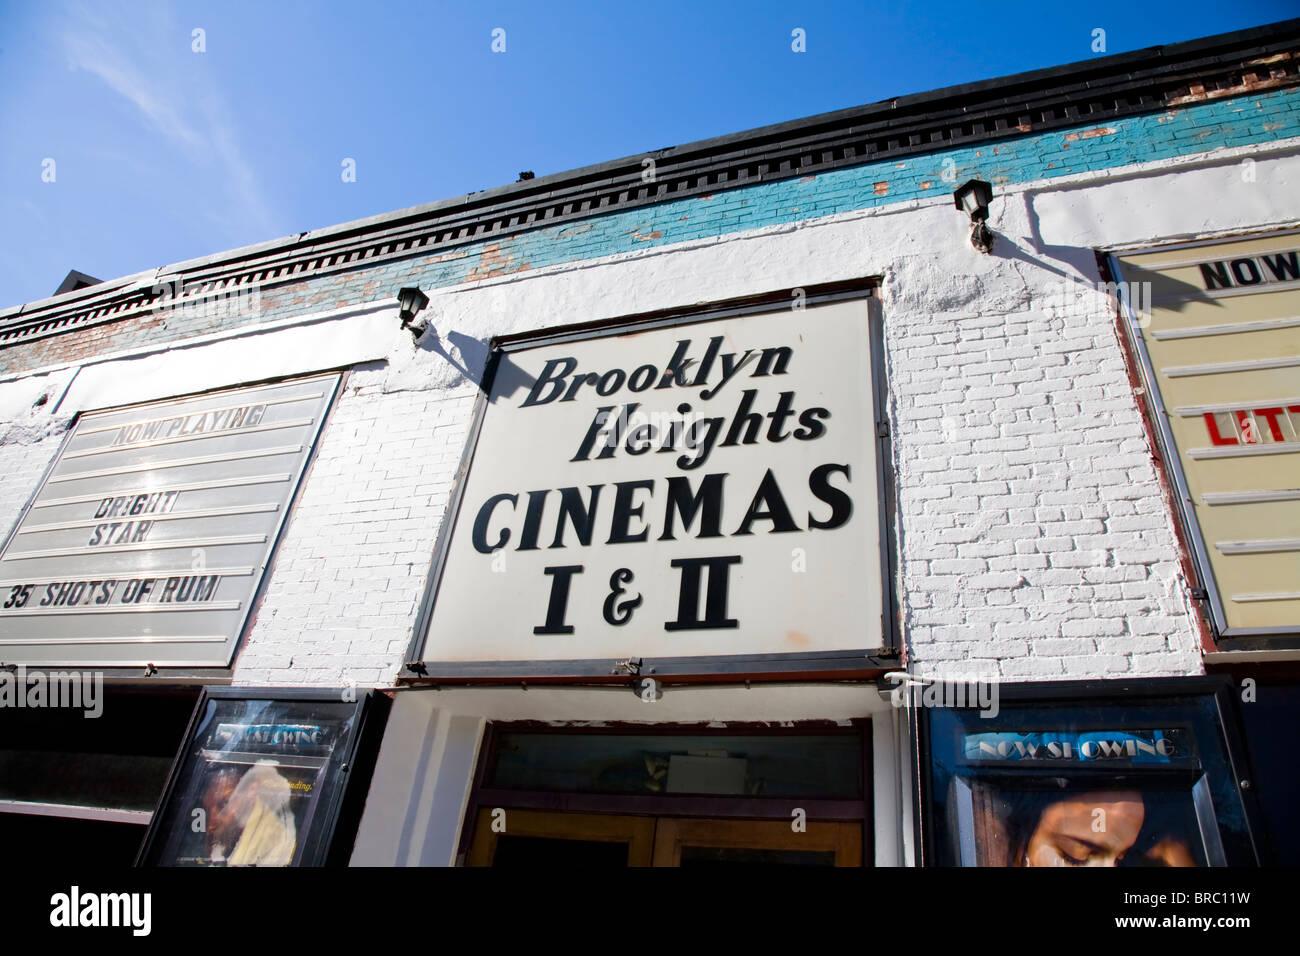 Cool cinema in Brooklyn New York - Stock Image